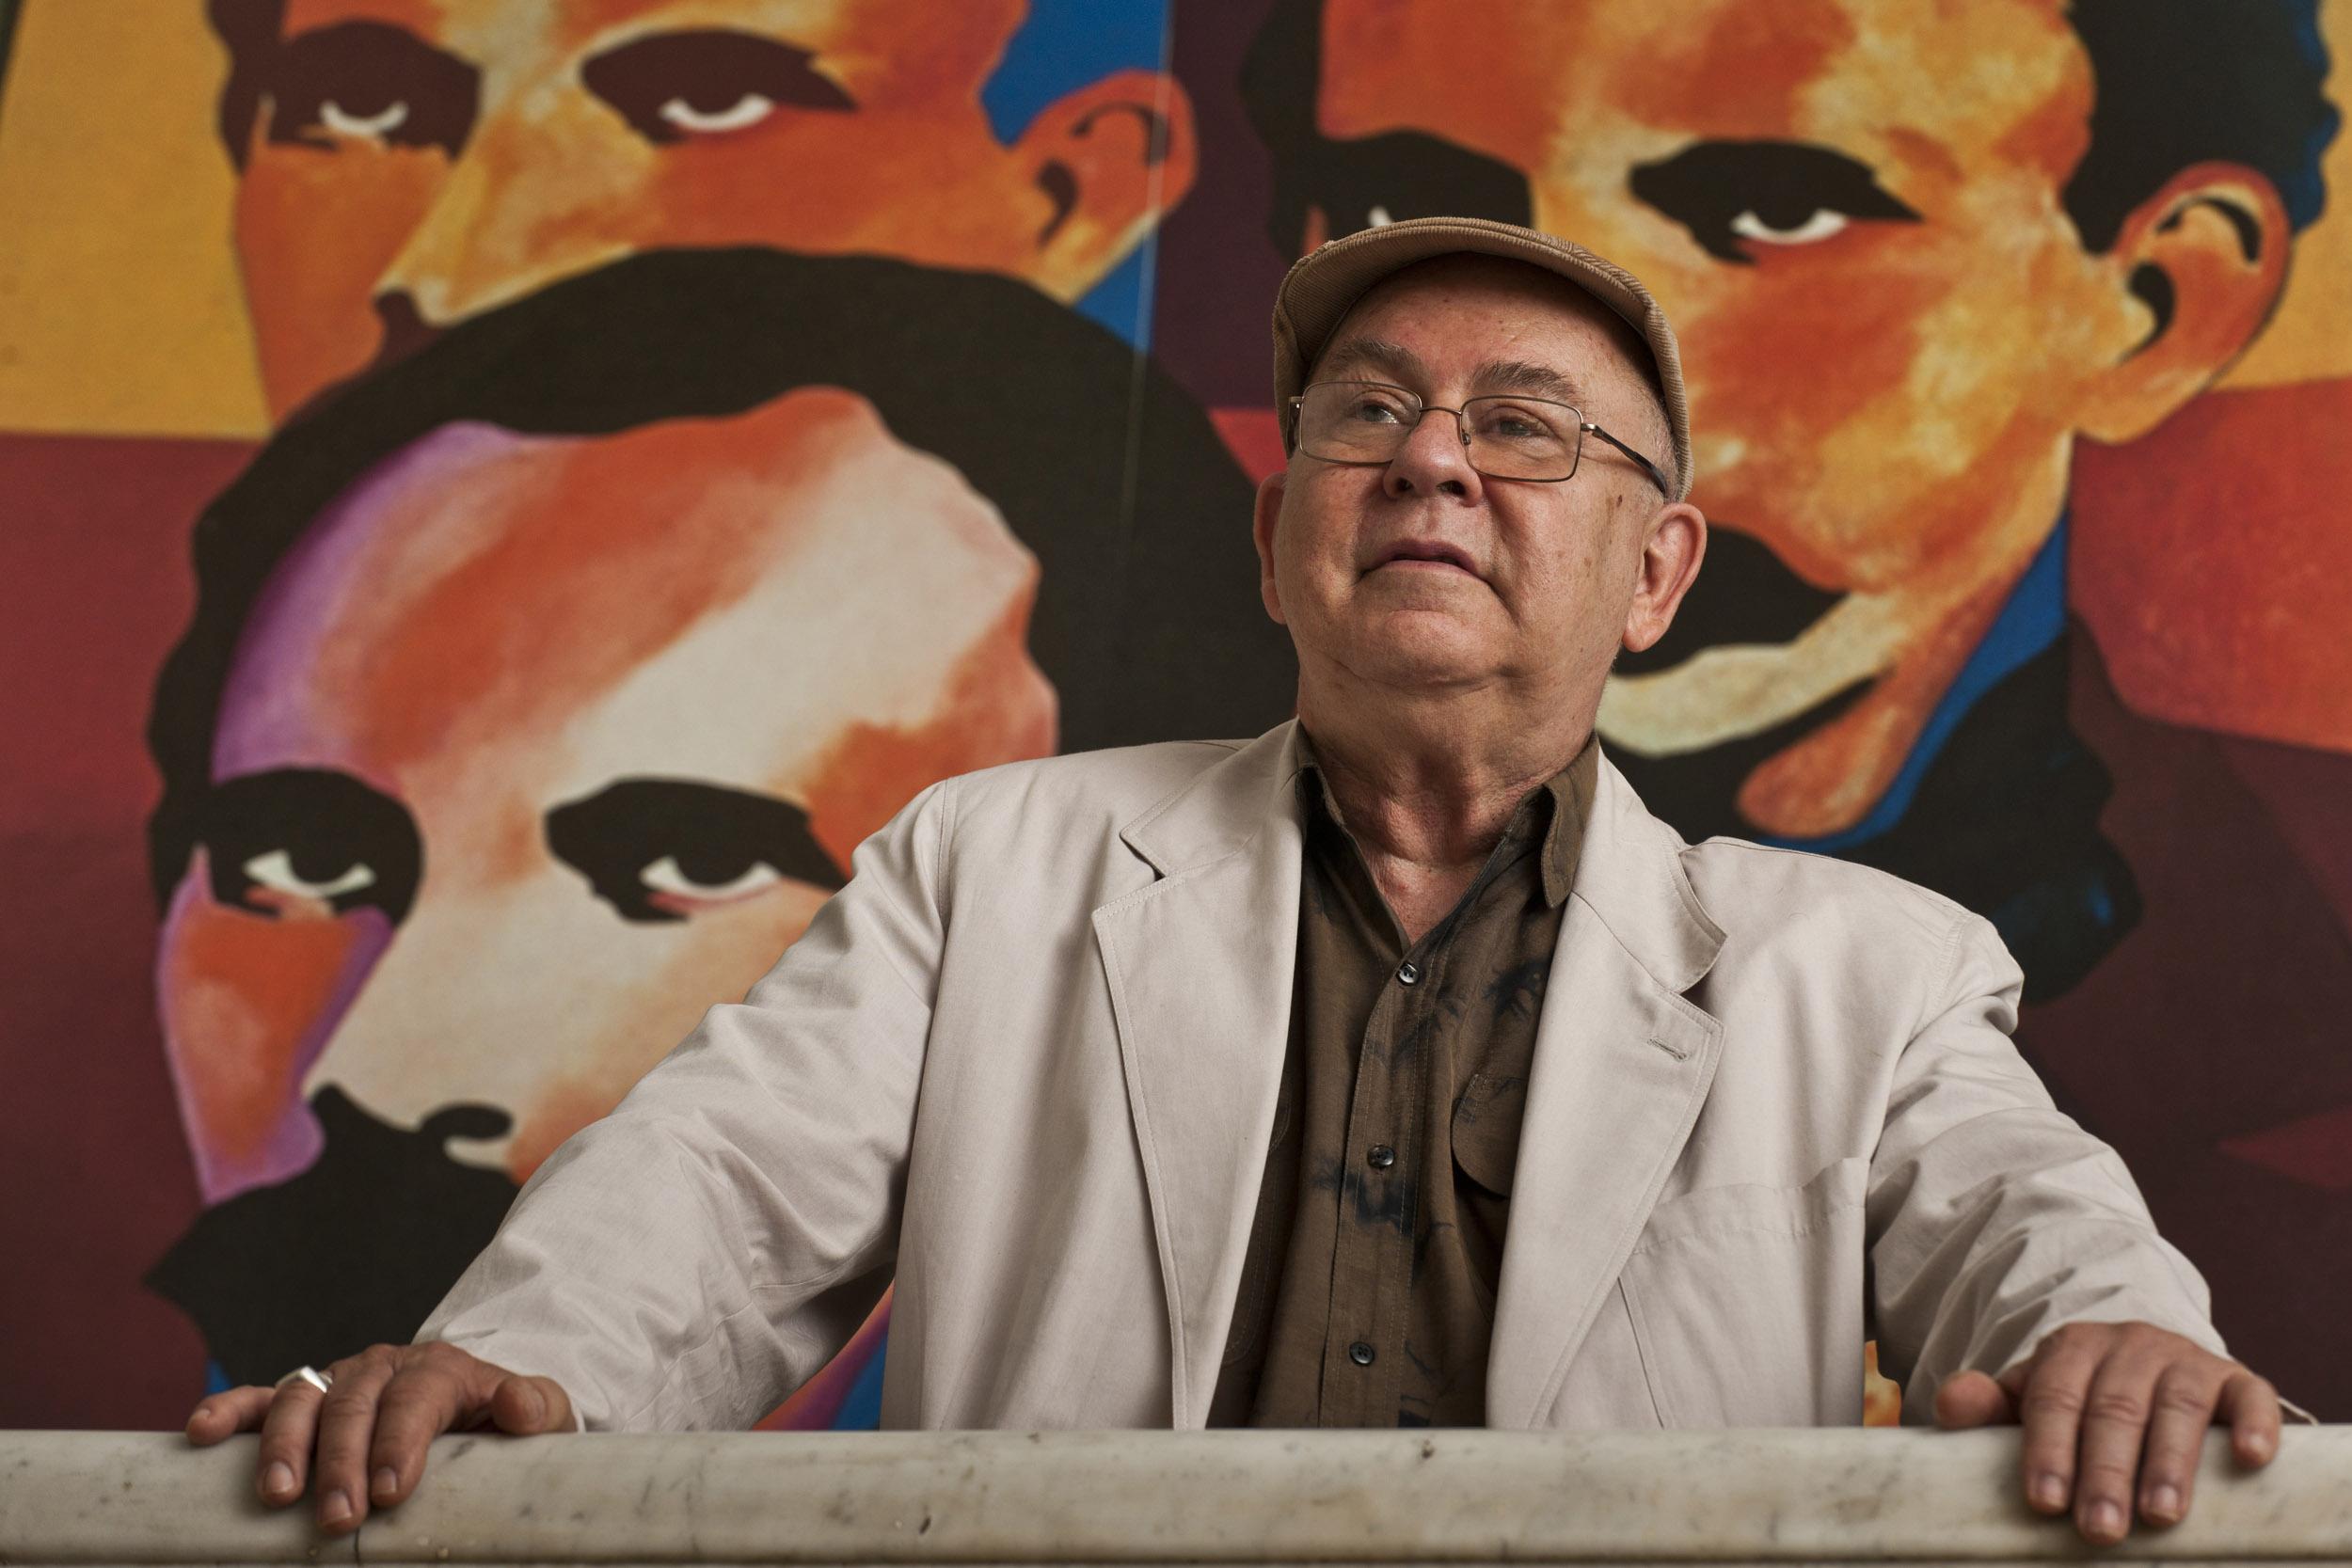 Miguel Barnet, writer - Illuminated Cuba - Hector Garrido, Aerial and human photography